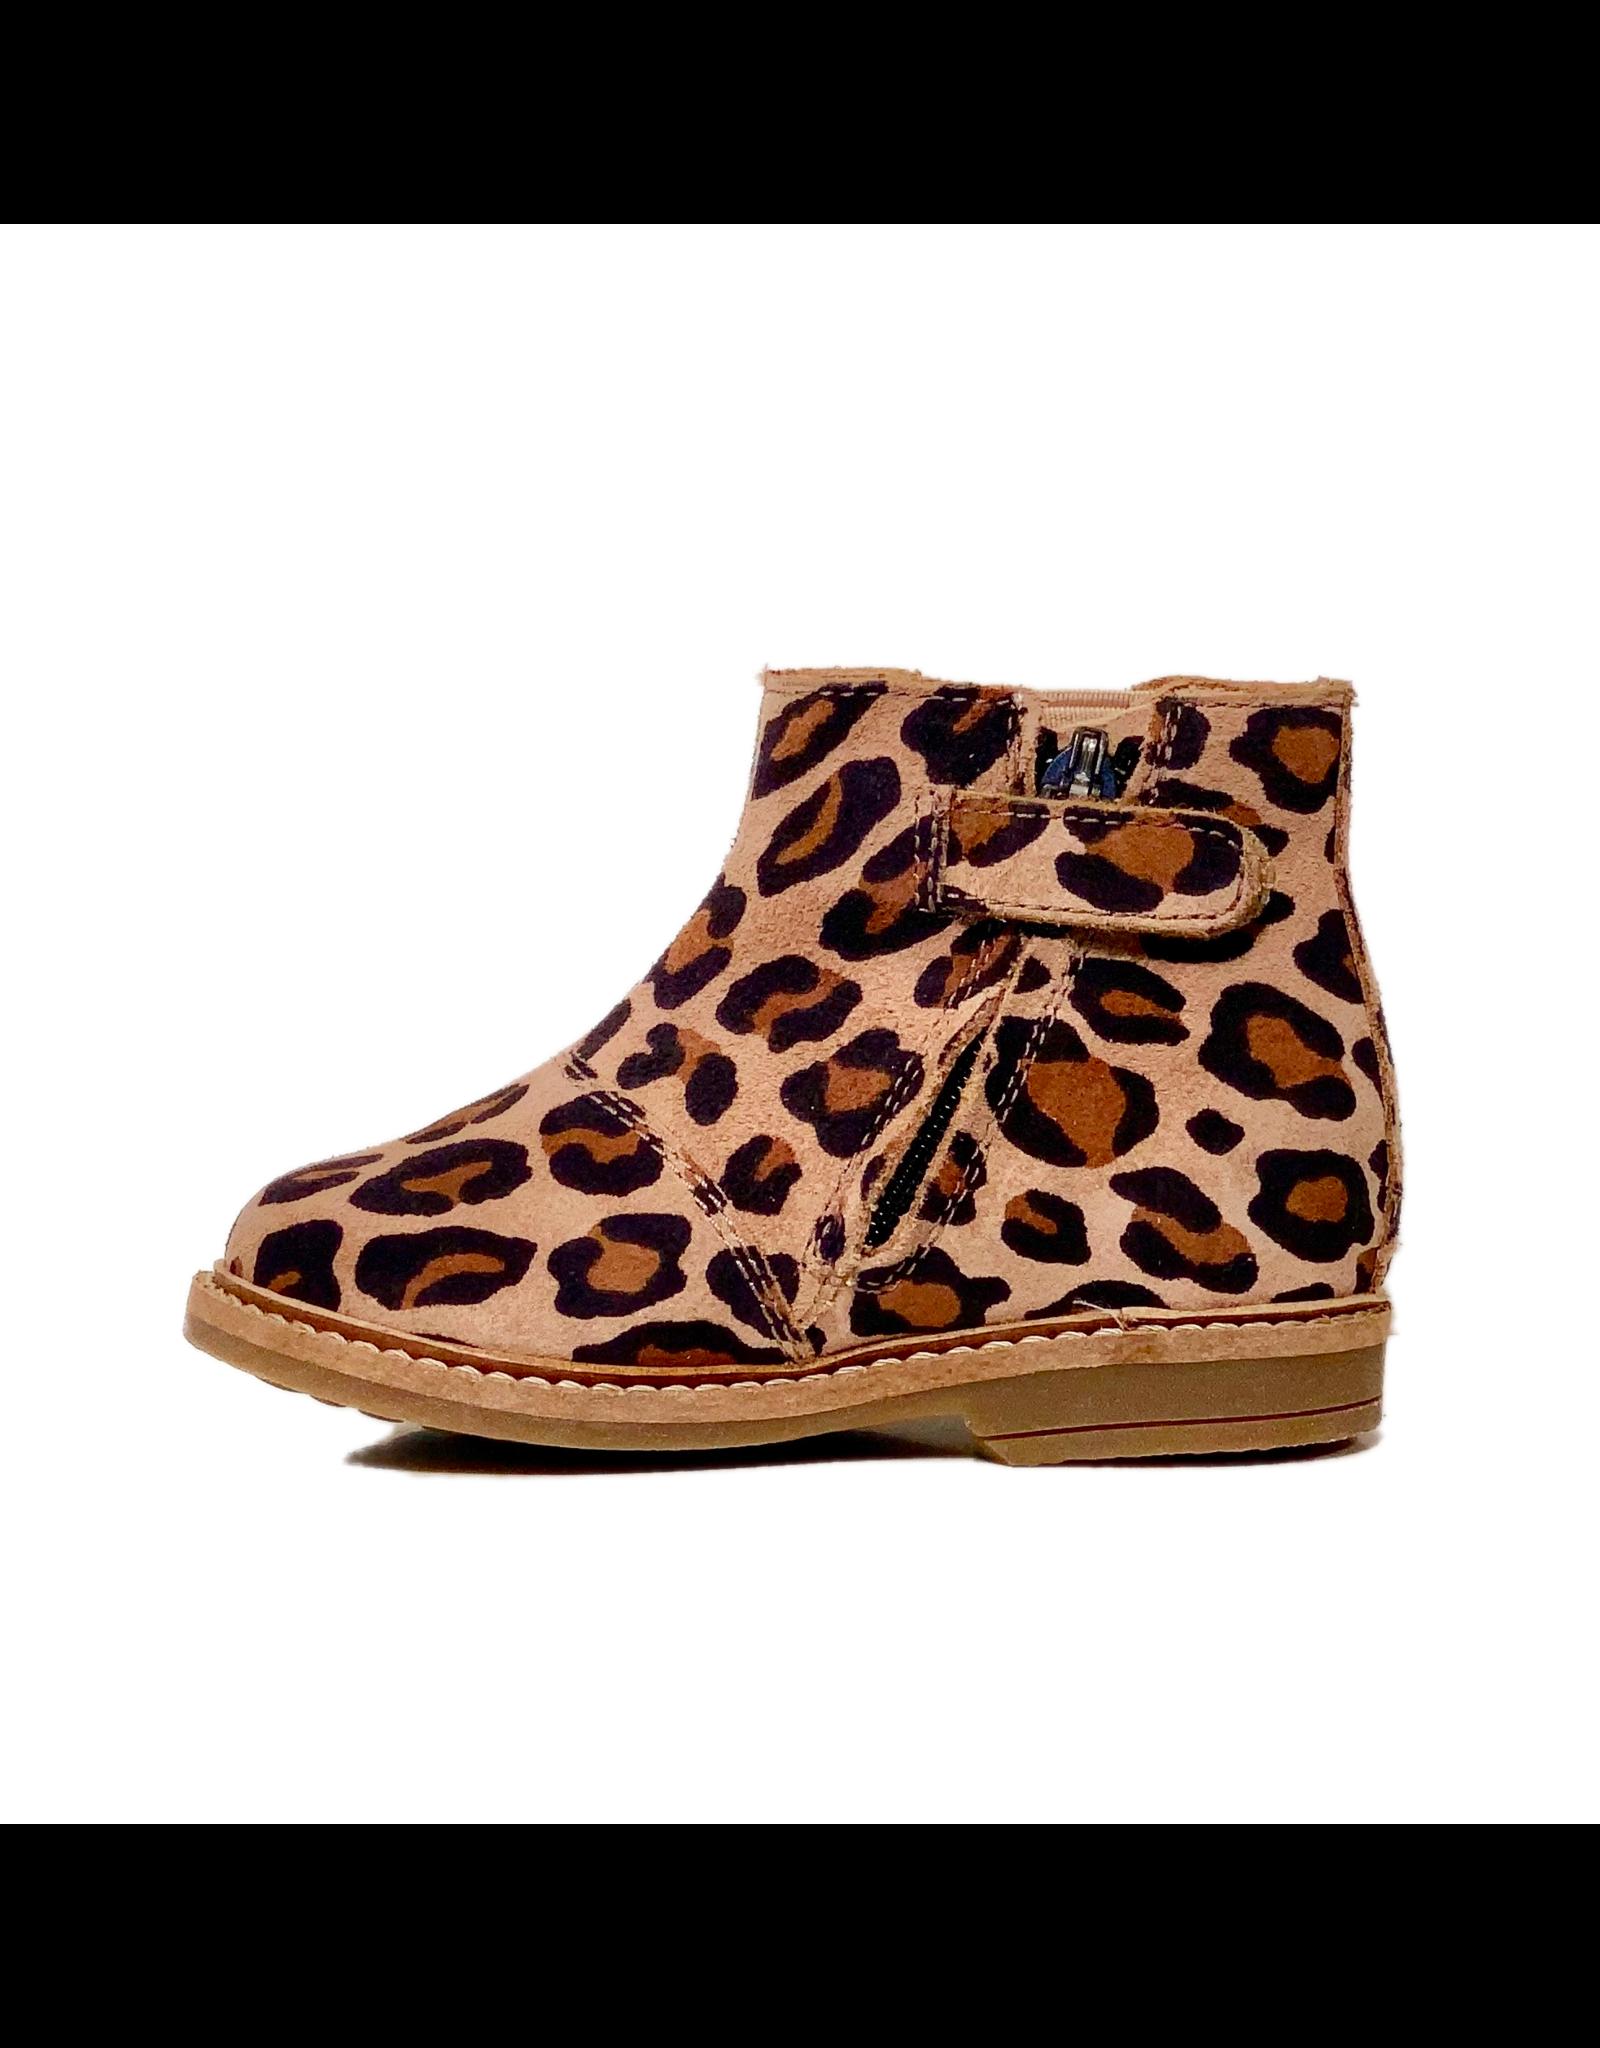 Pom d'api retro boots safari platine